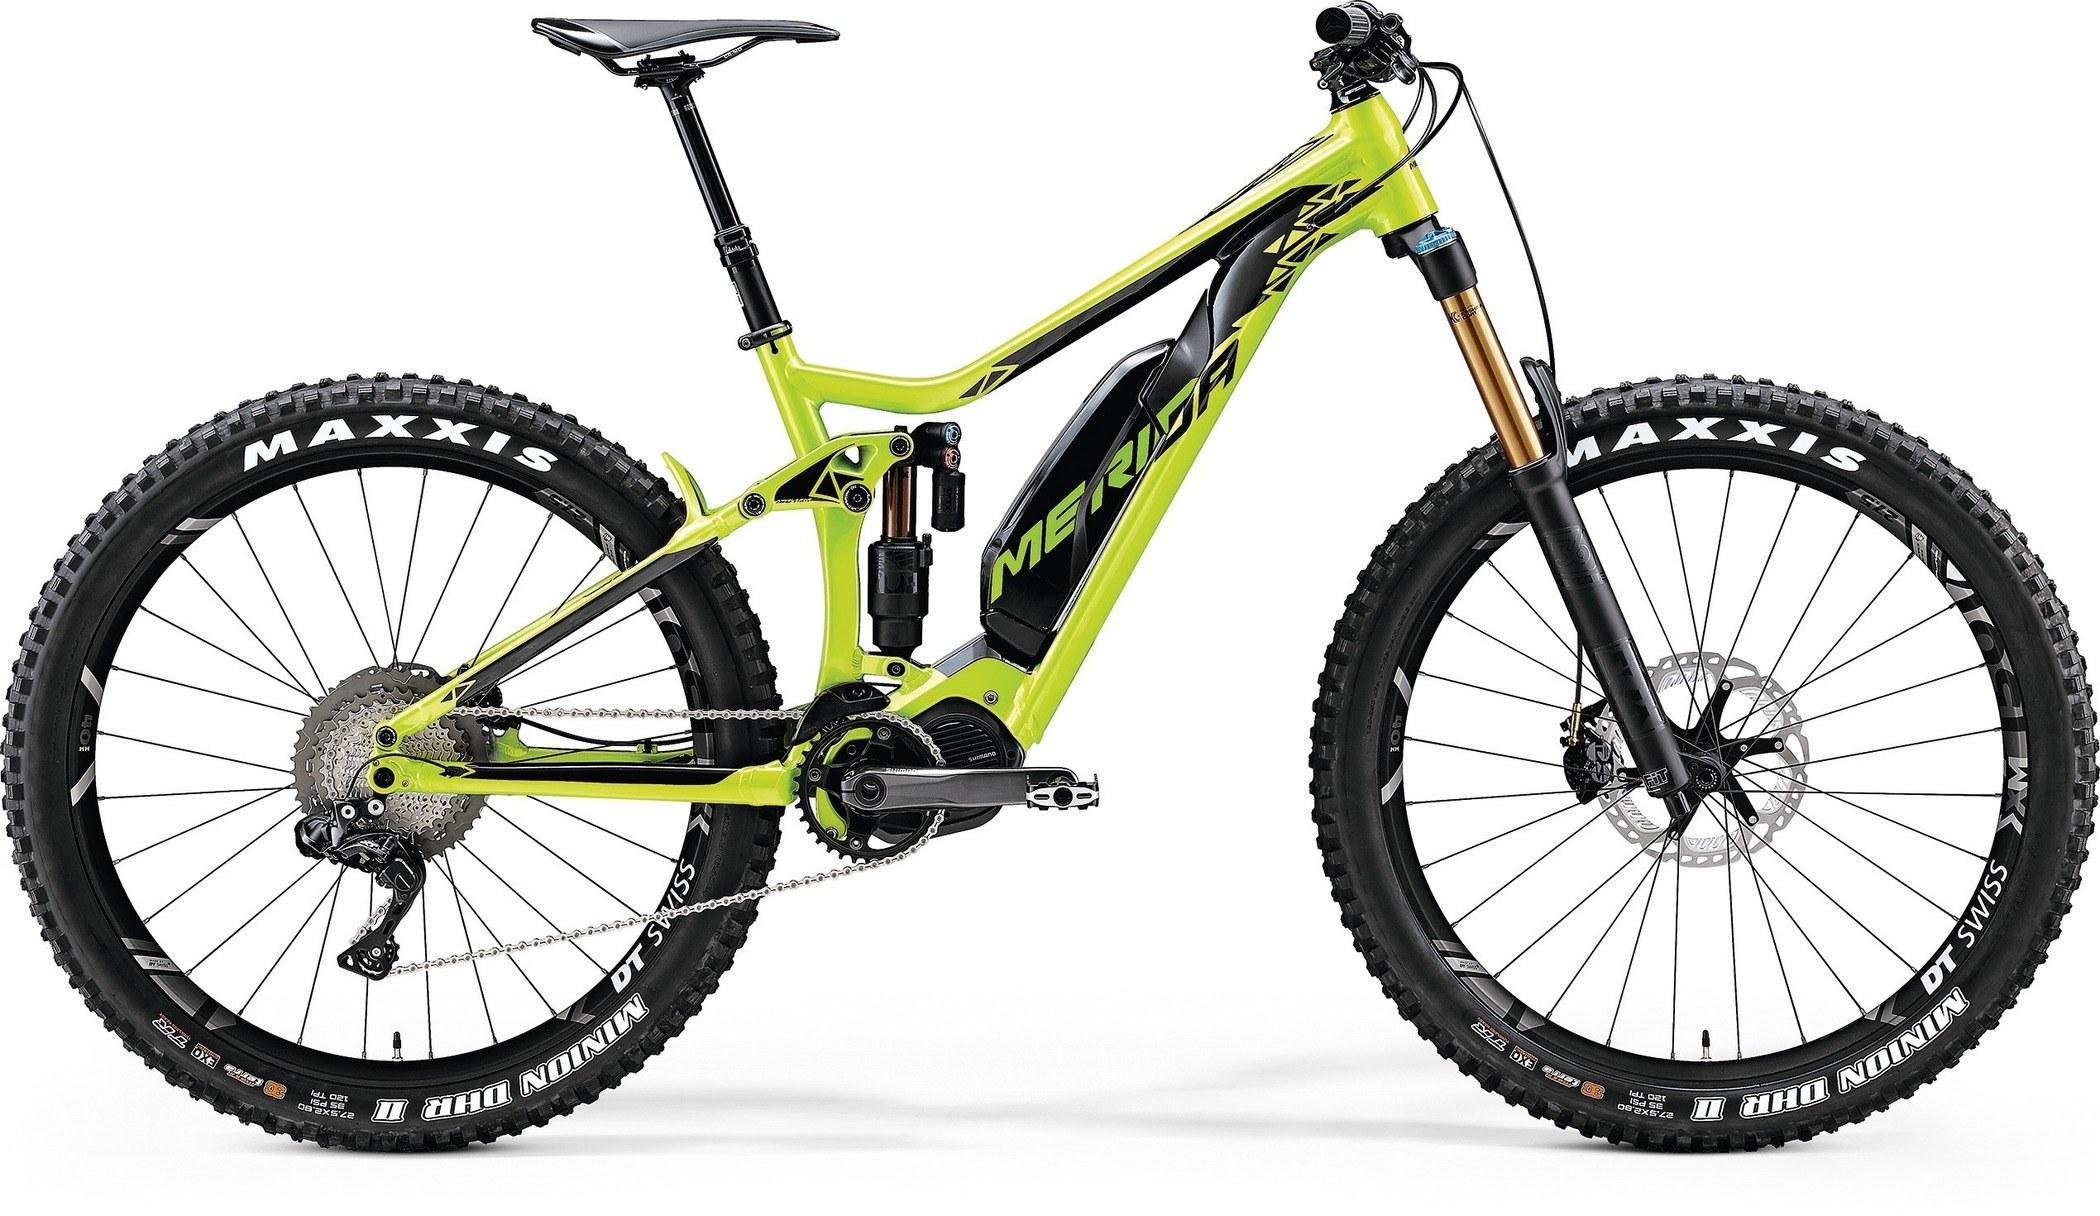 zoom-bike-picture-d8e9845cd165816f17024c277607482a